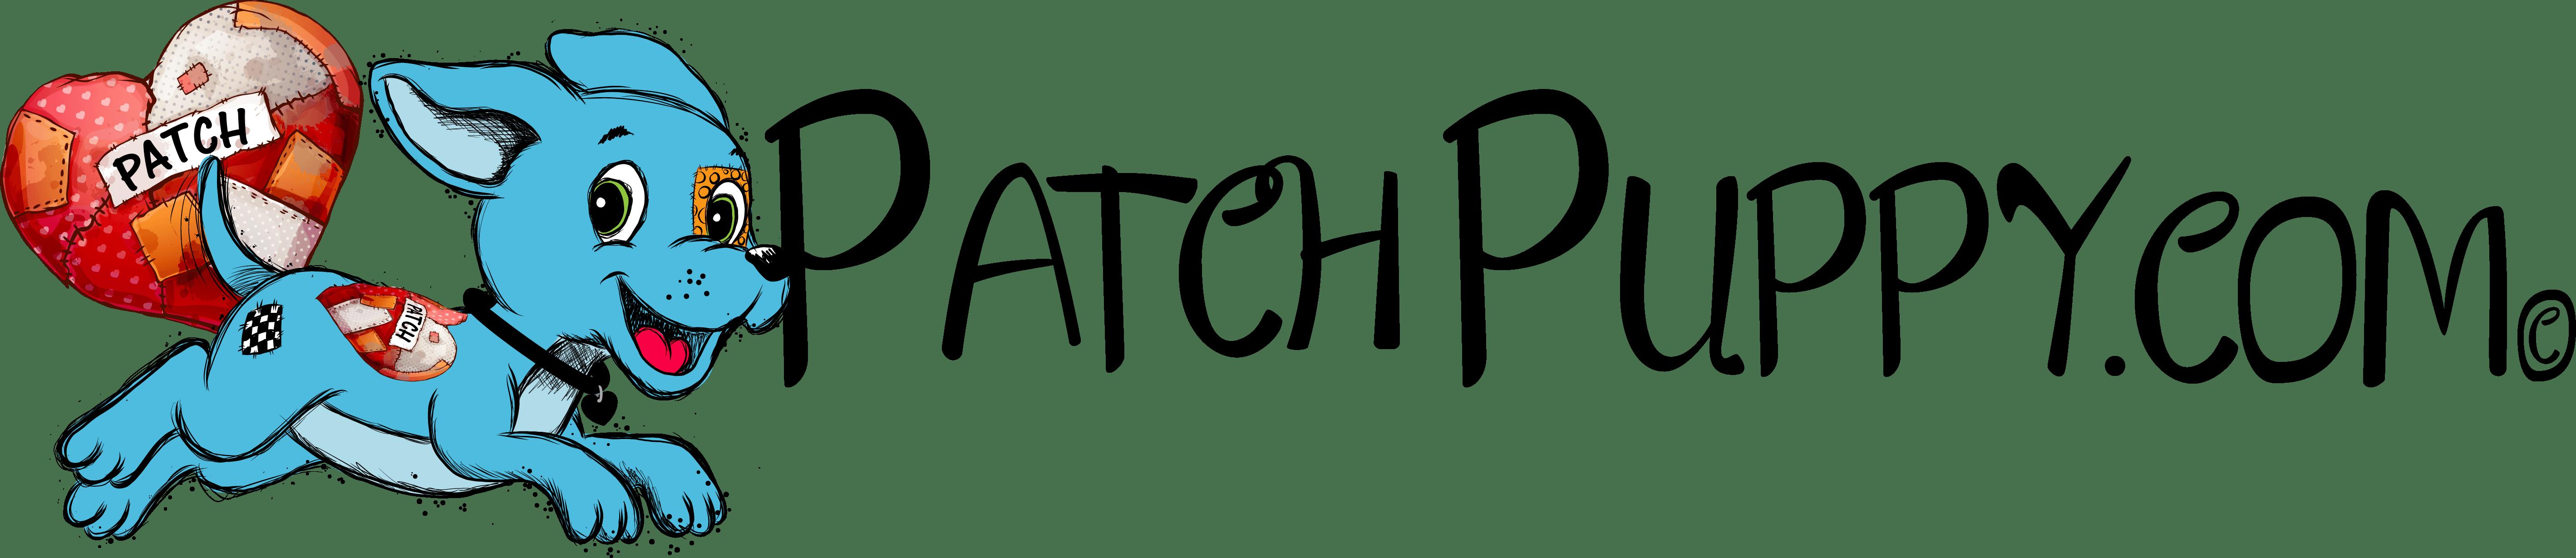 PatchPuppy.com